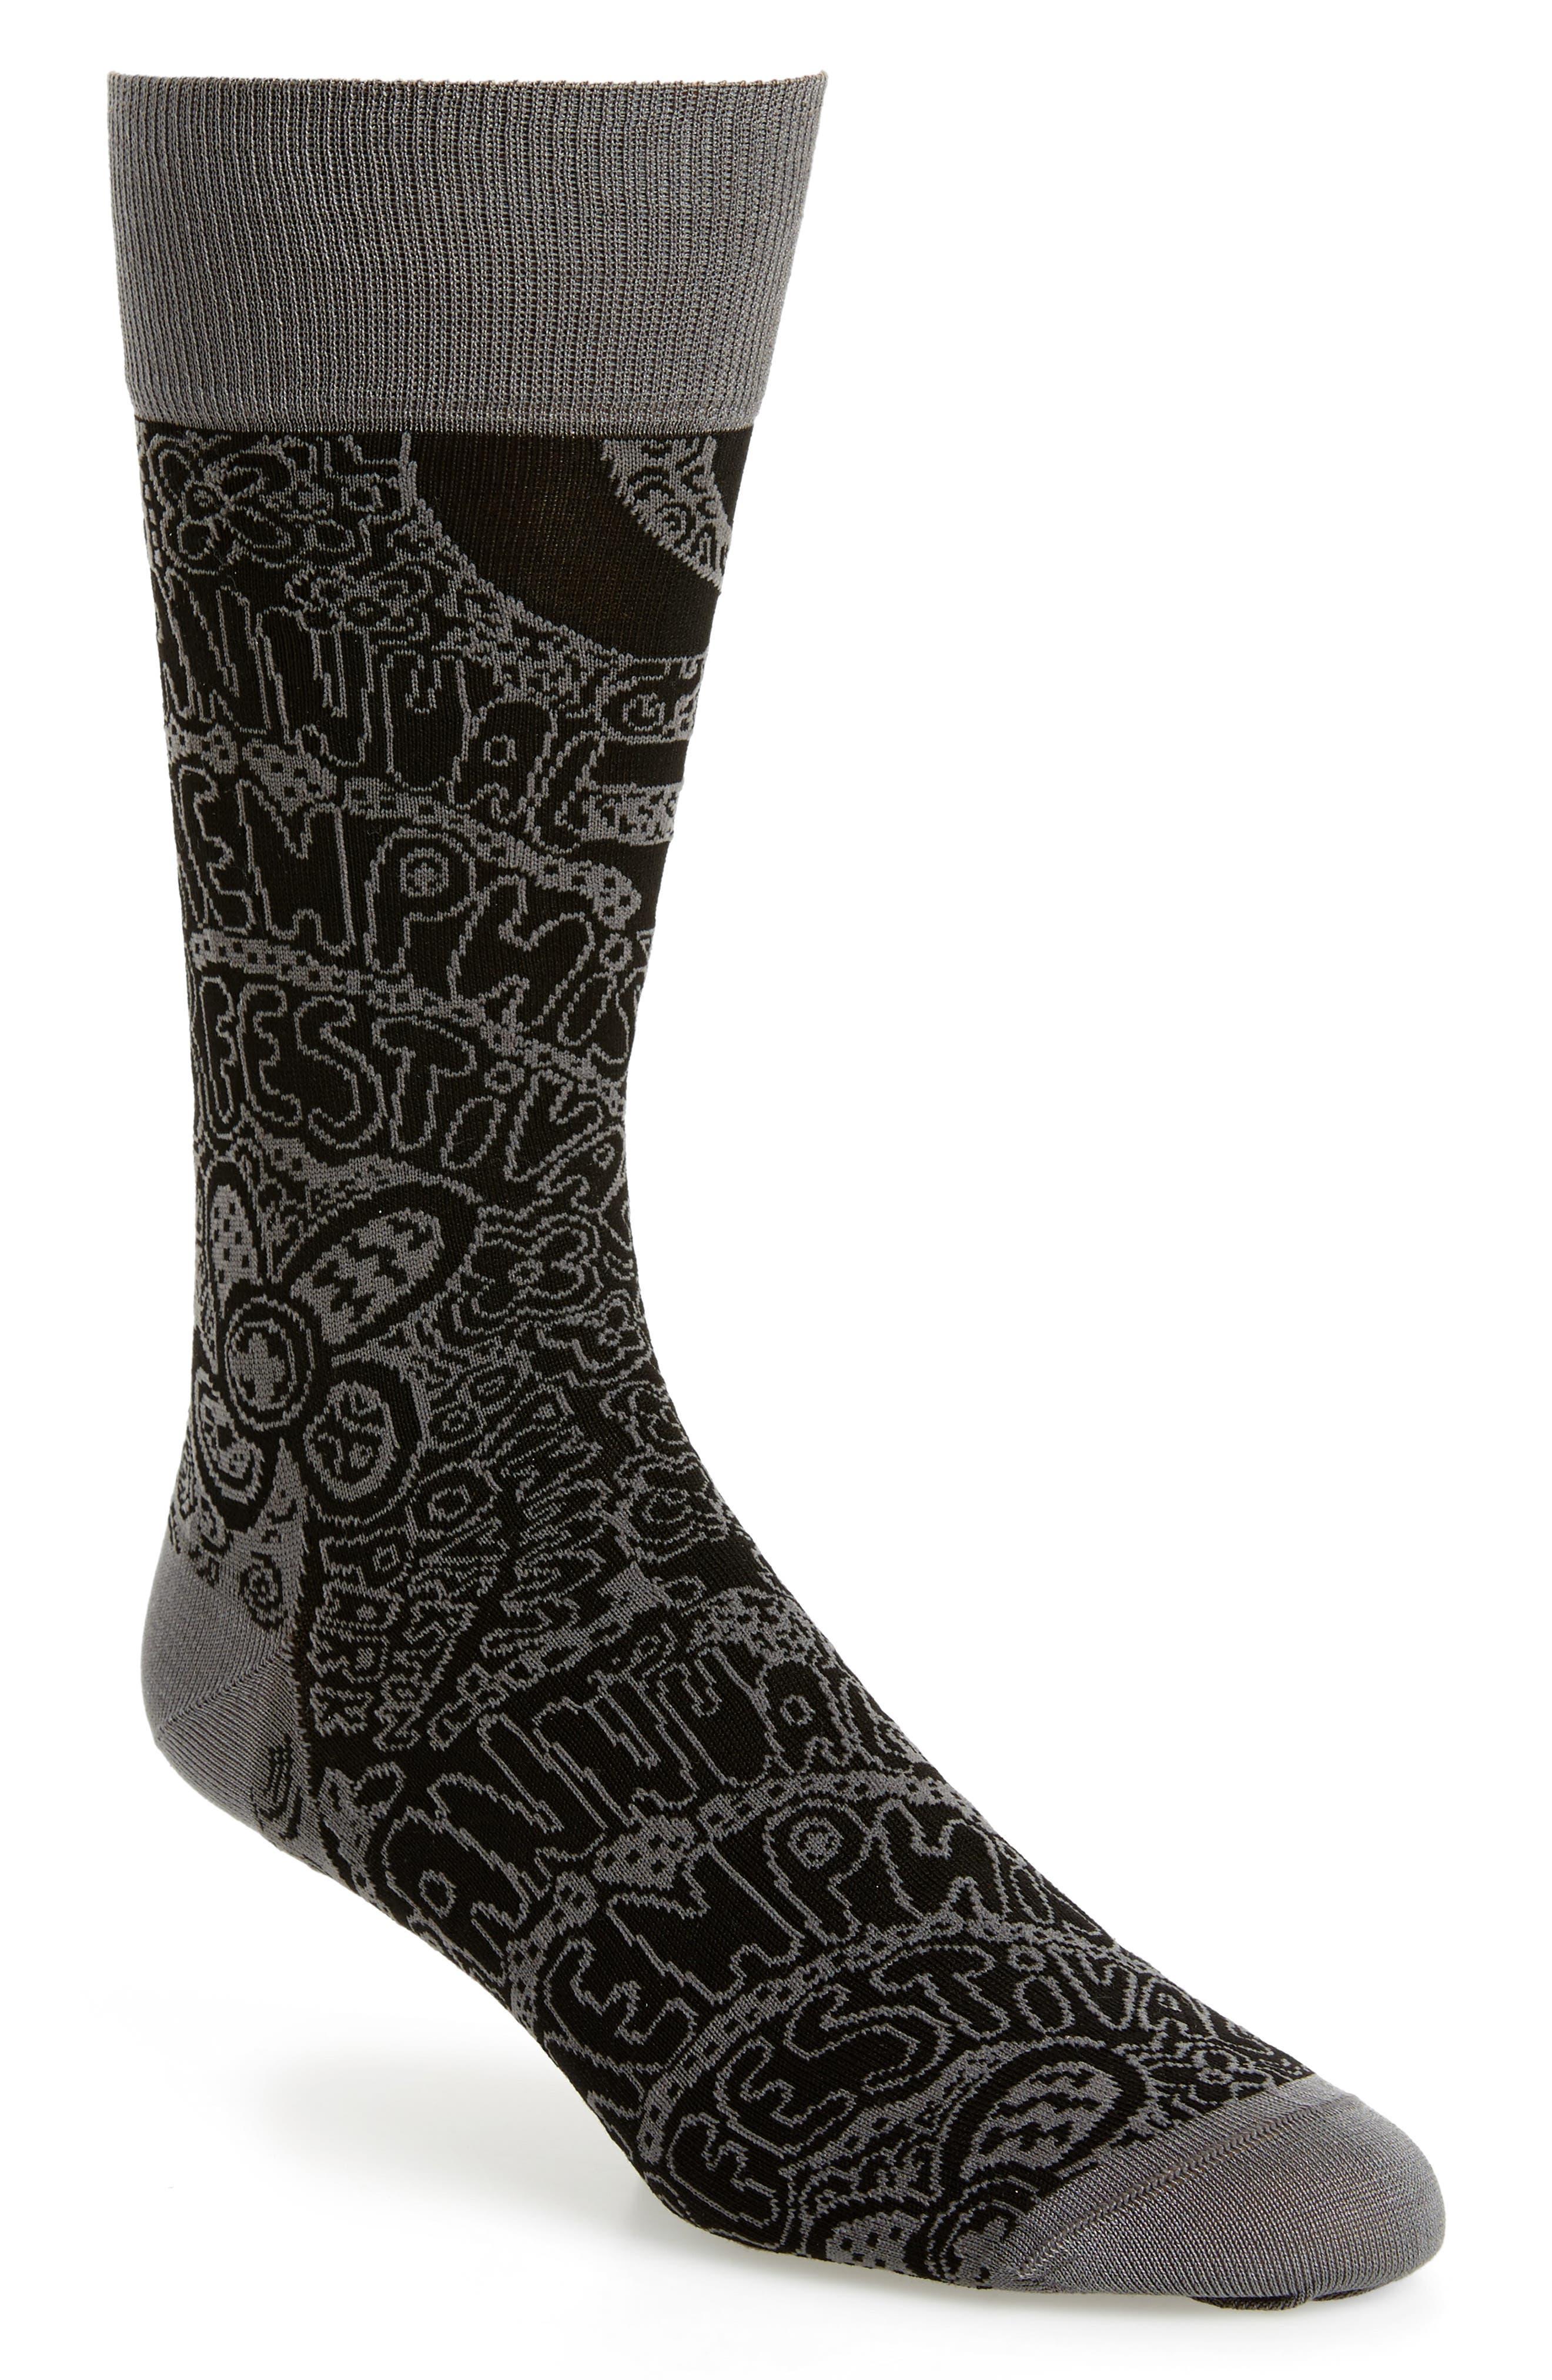 Mercerized Cotton Blend Socks,                         Main,                         color, Black